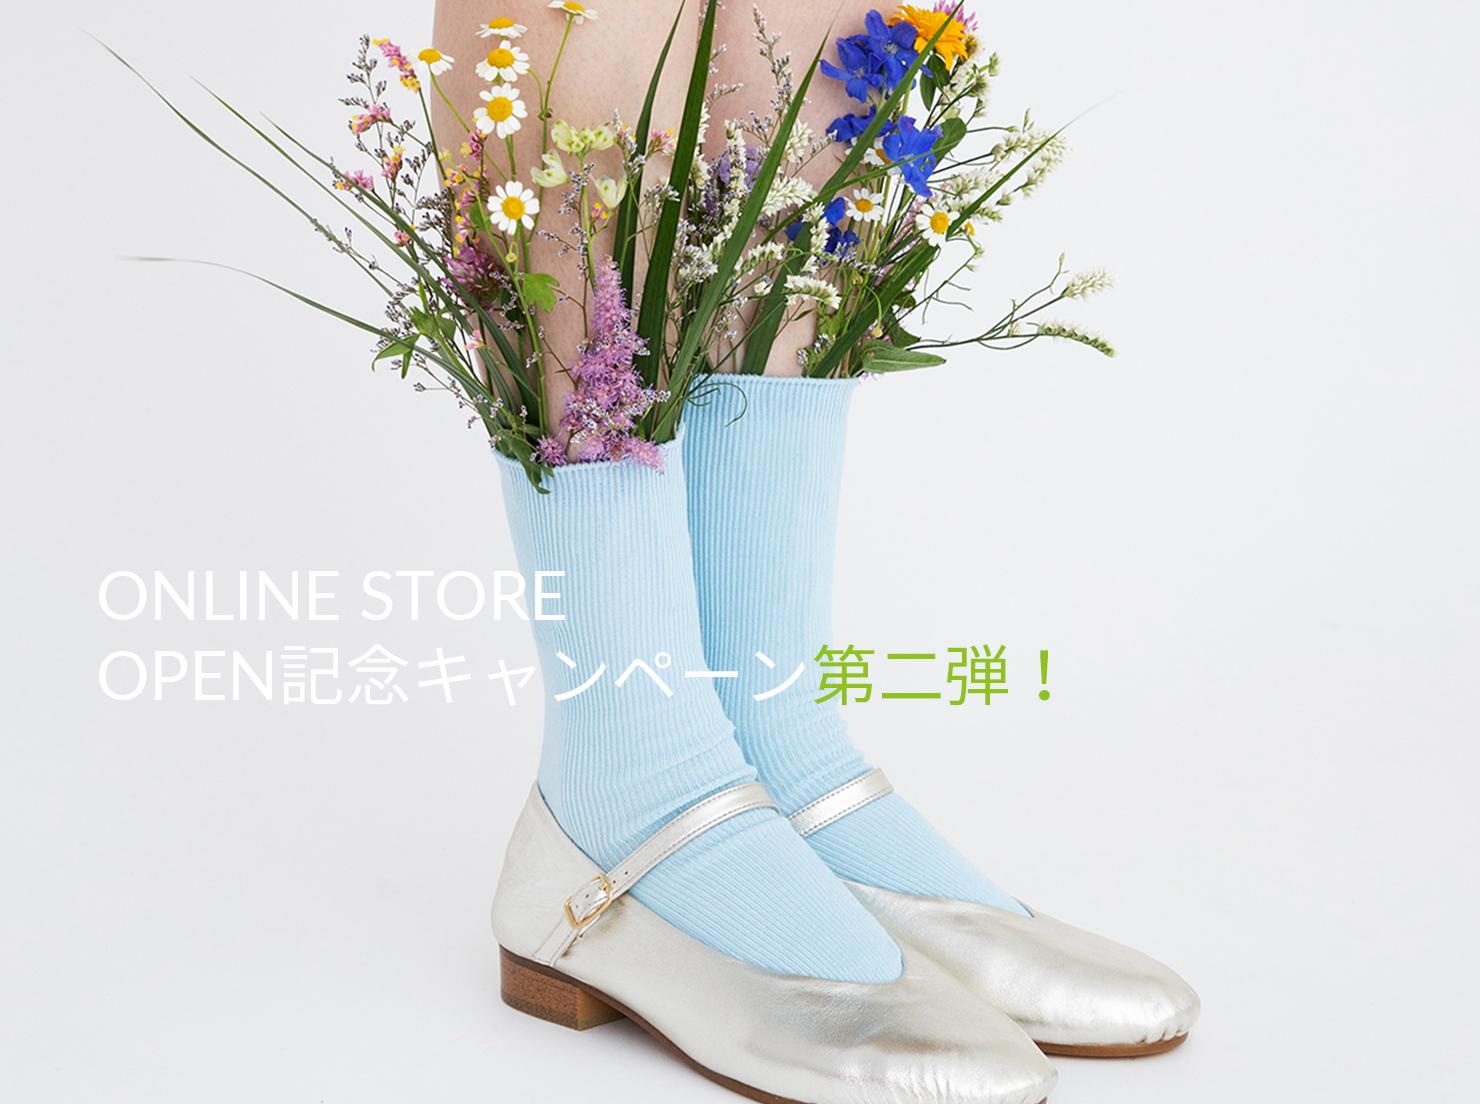 ONLINE STORE OPEN 記念キャンペーン第二弾!